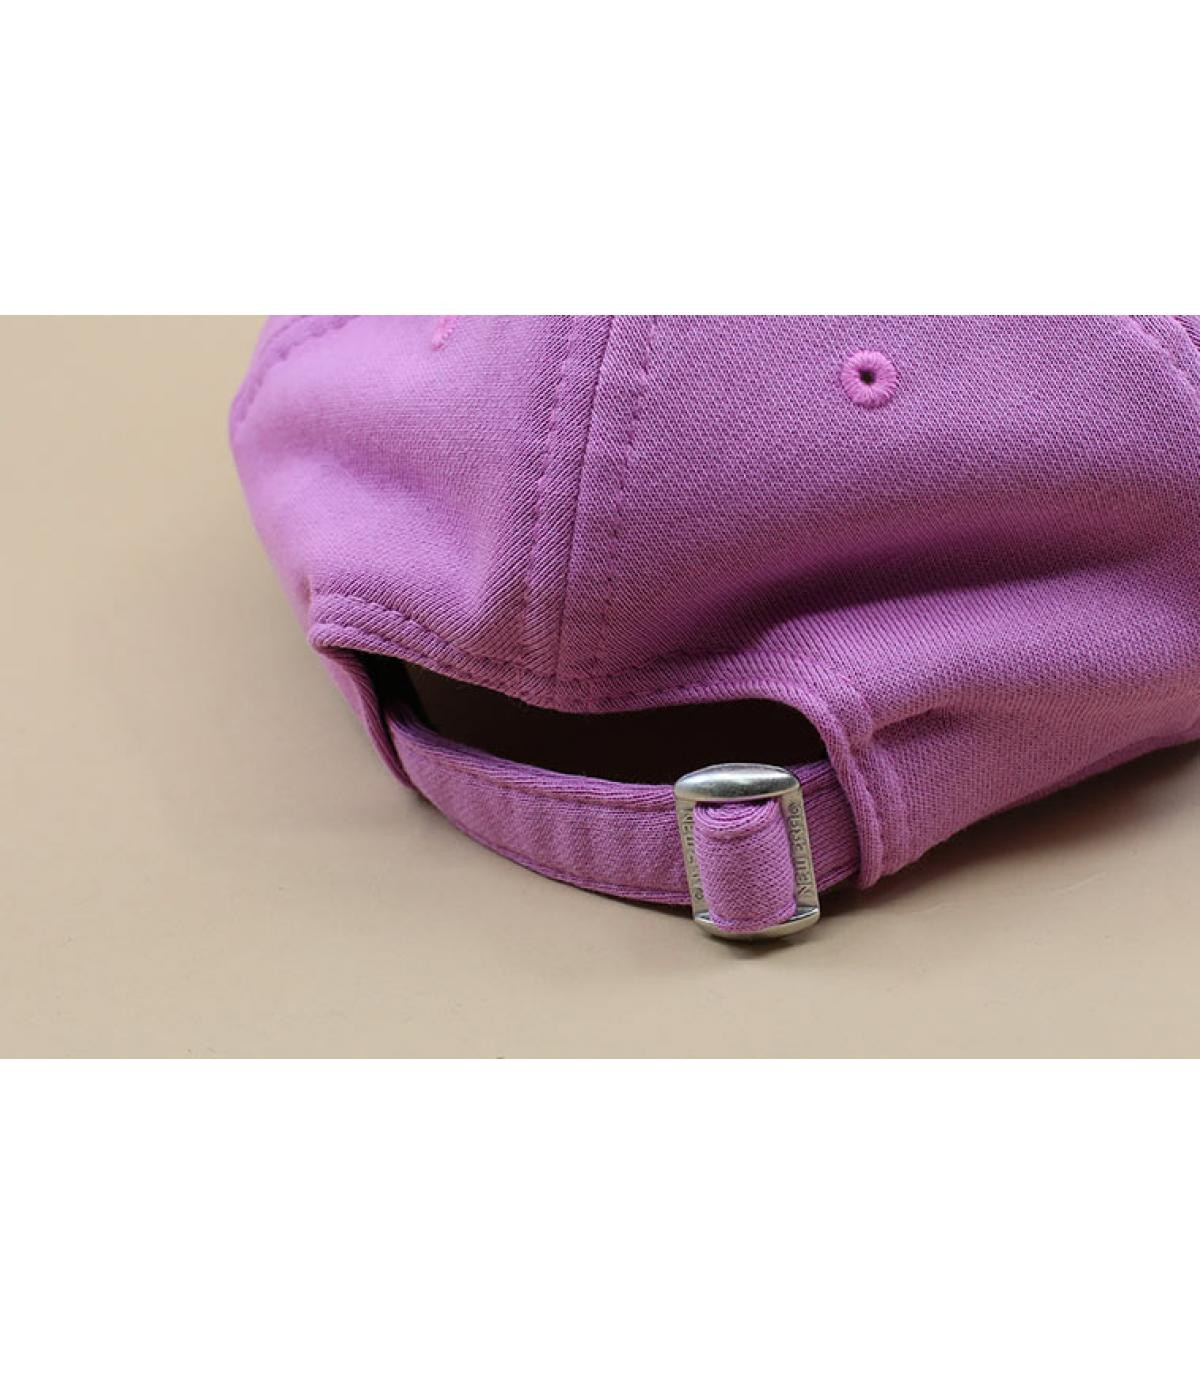 Details Jersey Pack 940 LA pink - Abbildung 5